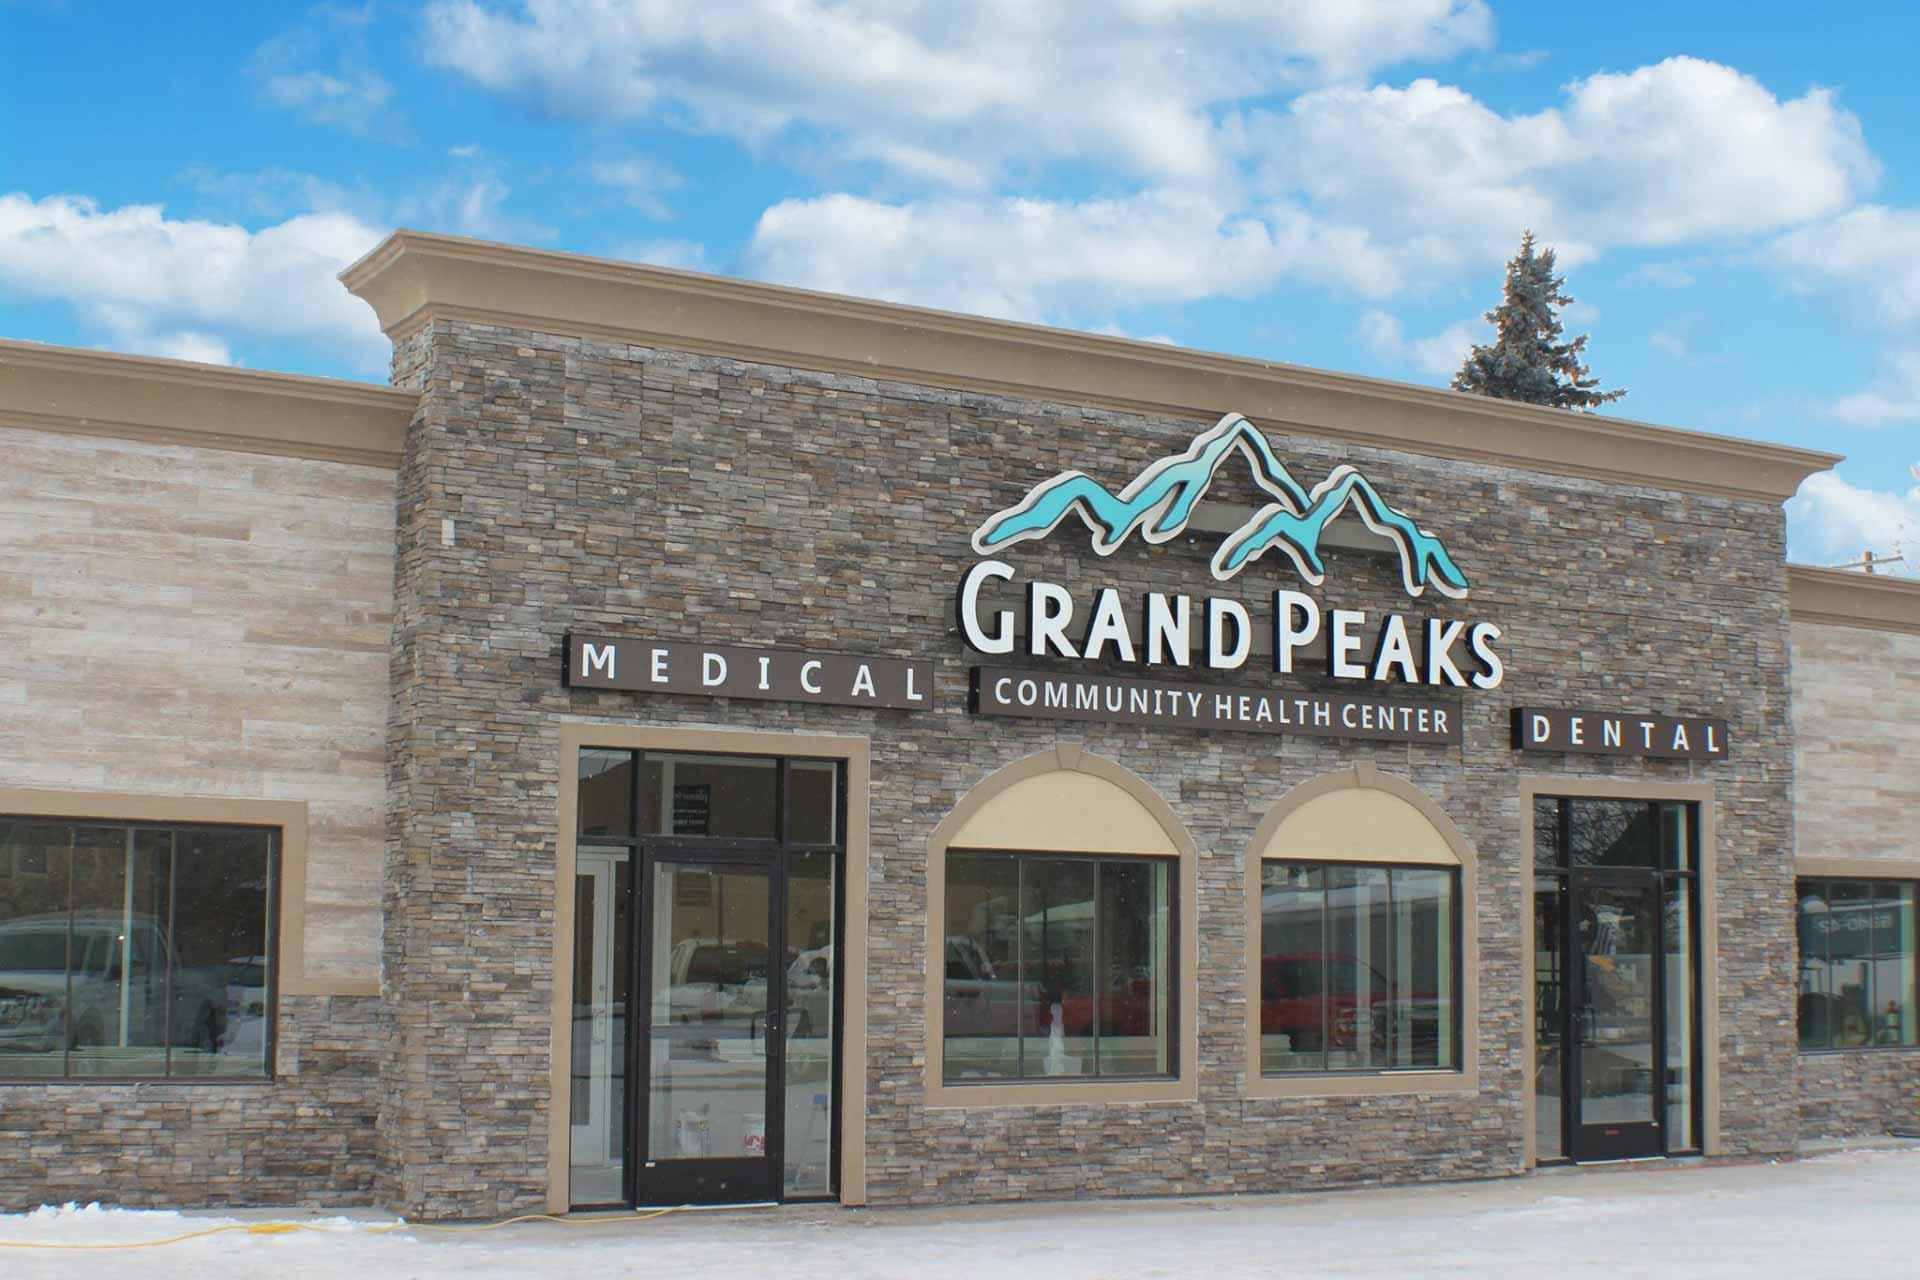 Grand Peaks Community Health Center - rexburg wellness center